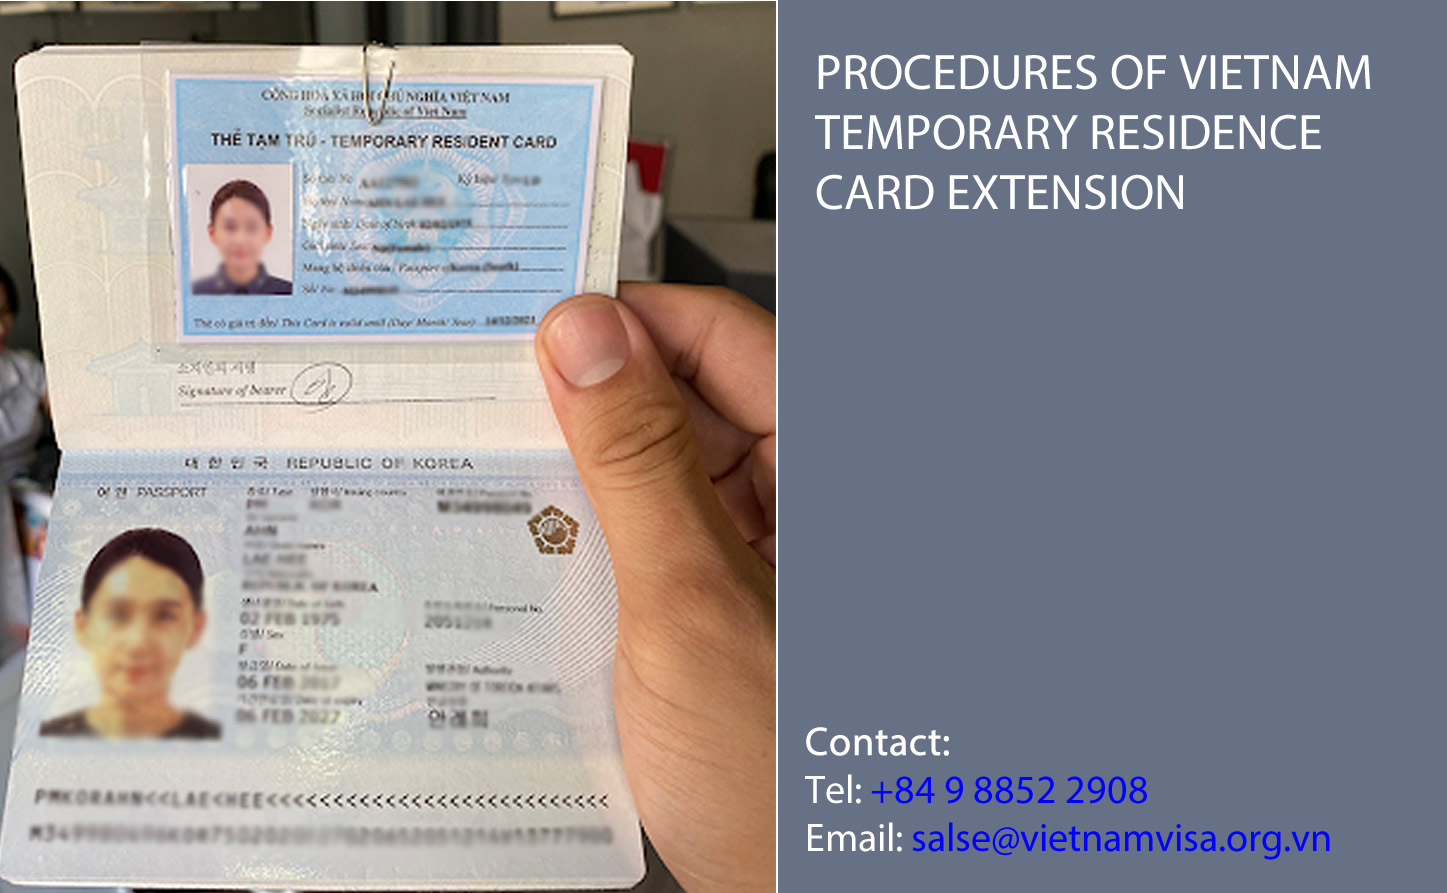 Procedures of Vietnam temporary residence card extension